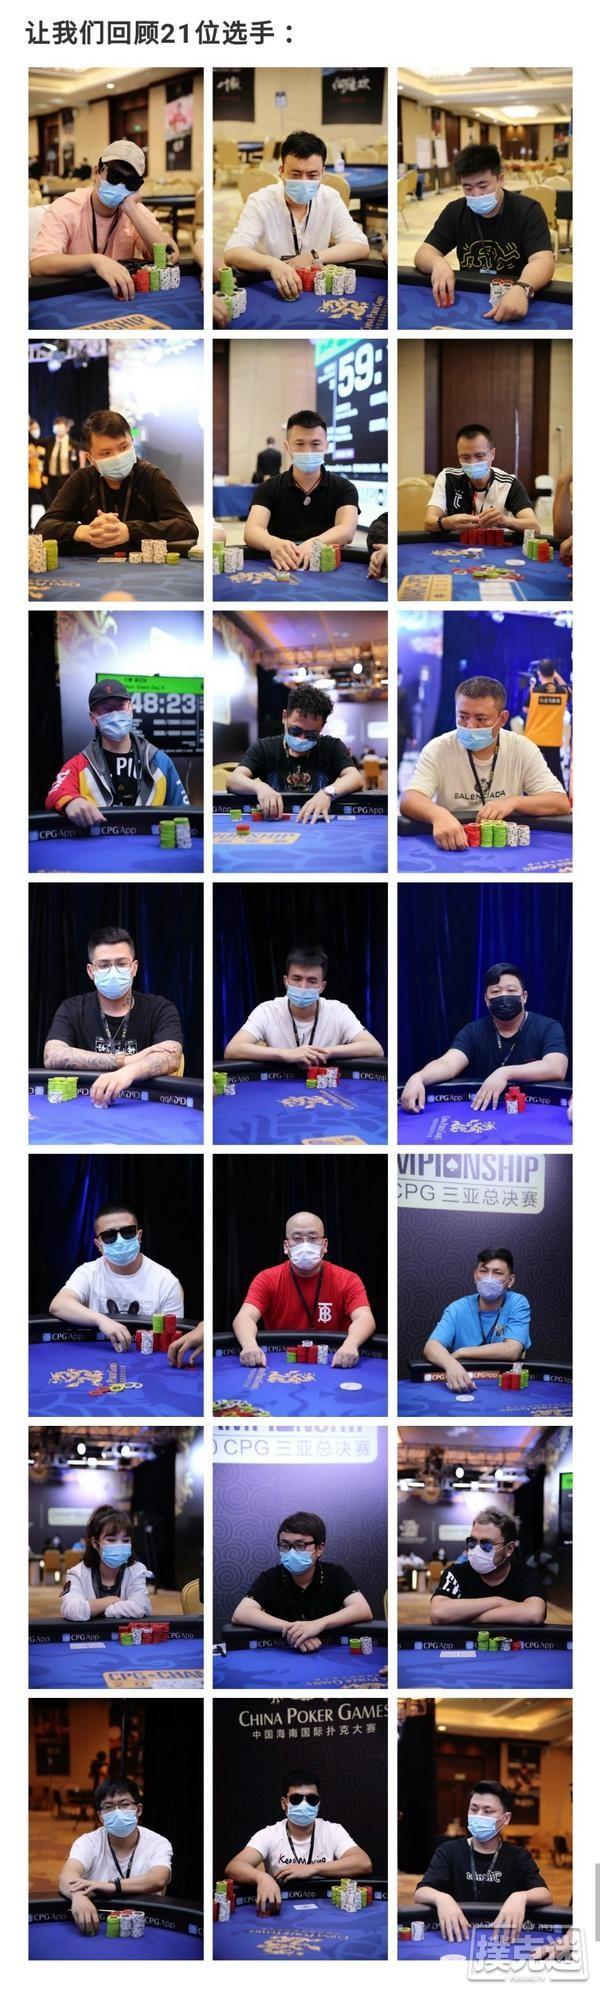 【6upoker】2020CPG®三亚总决赛|主赛事FT诞生!刘淼以2455万记分成为全场CL!